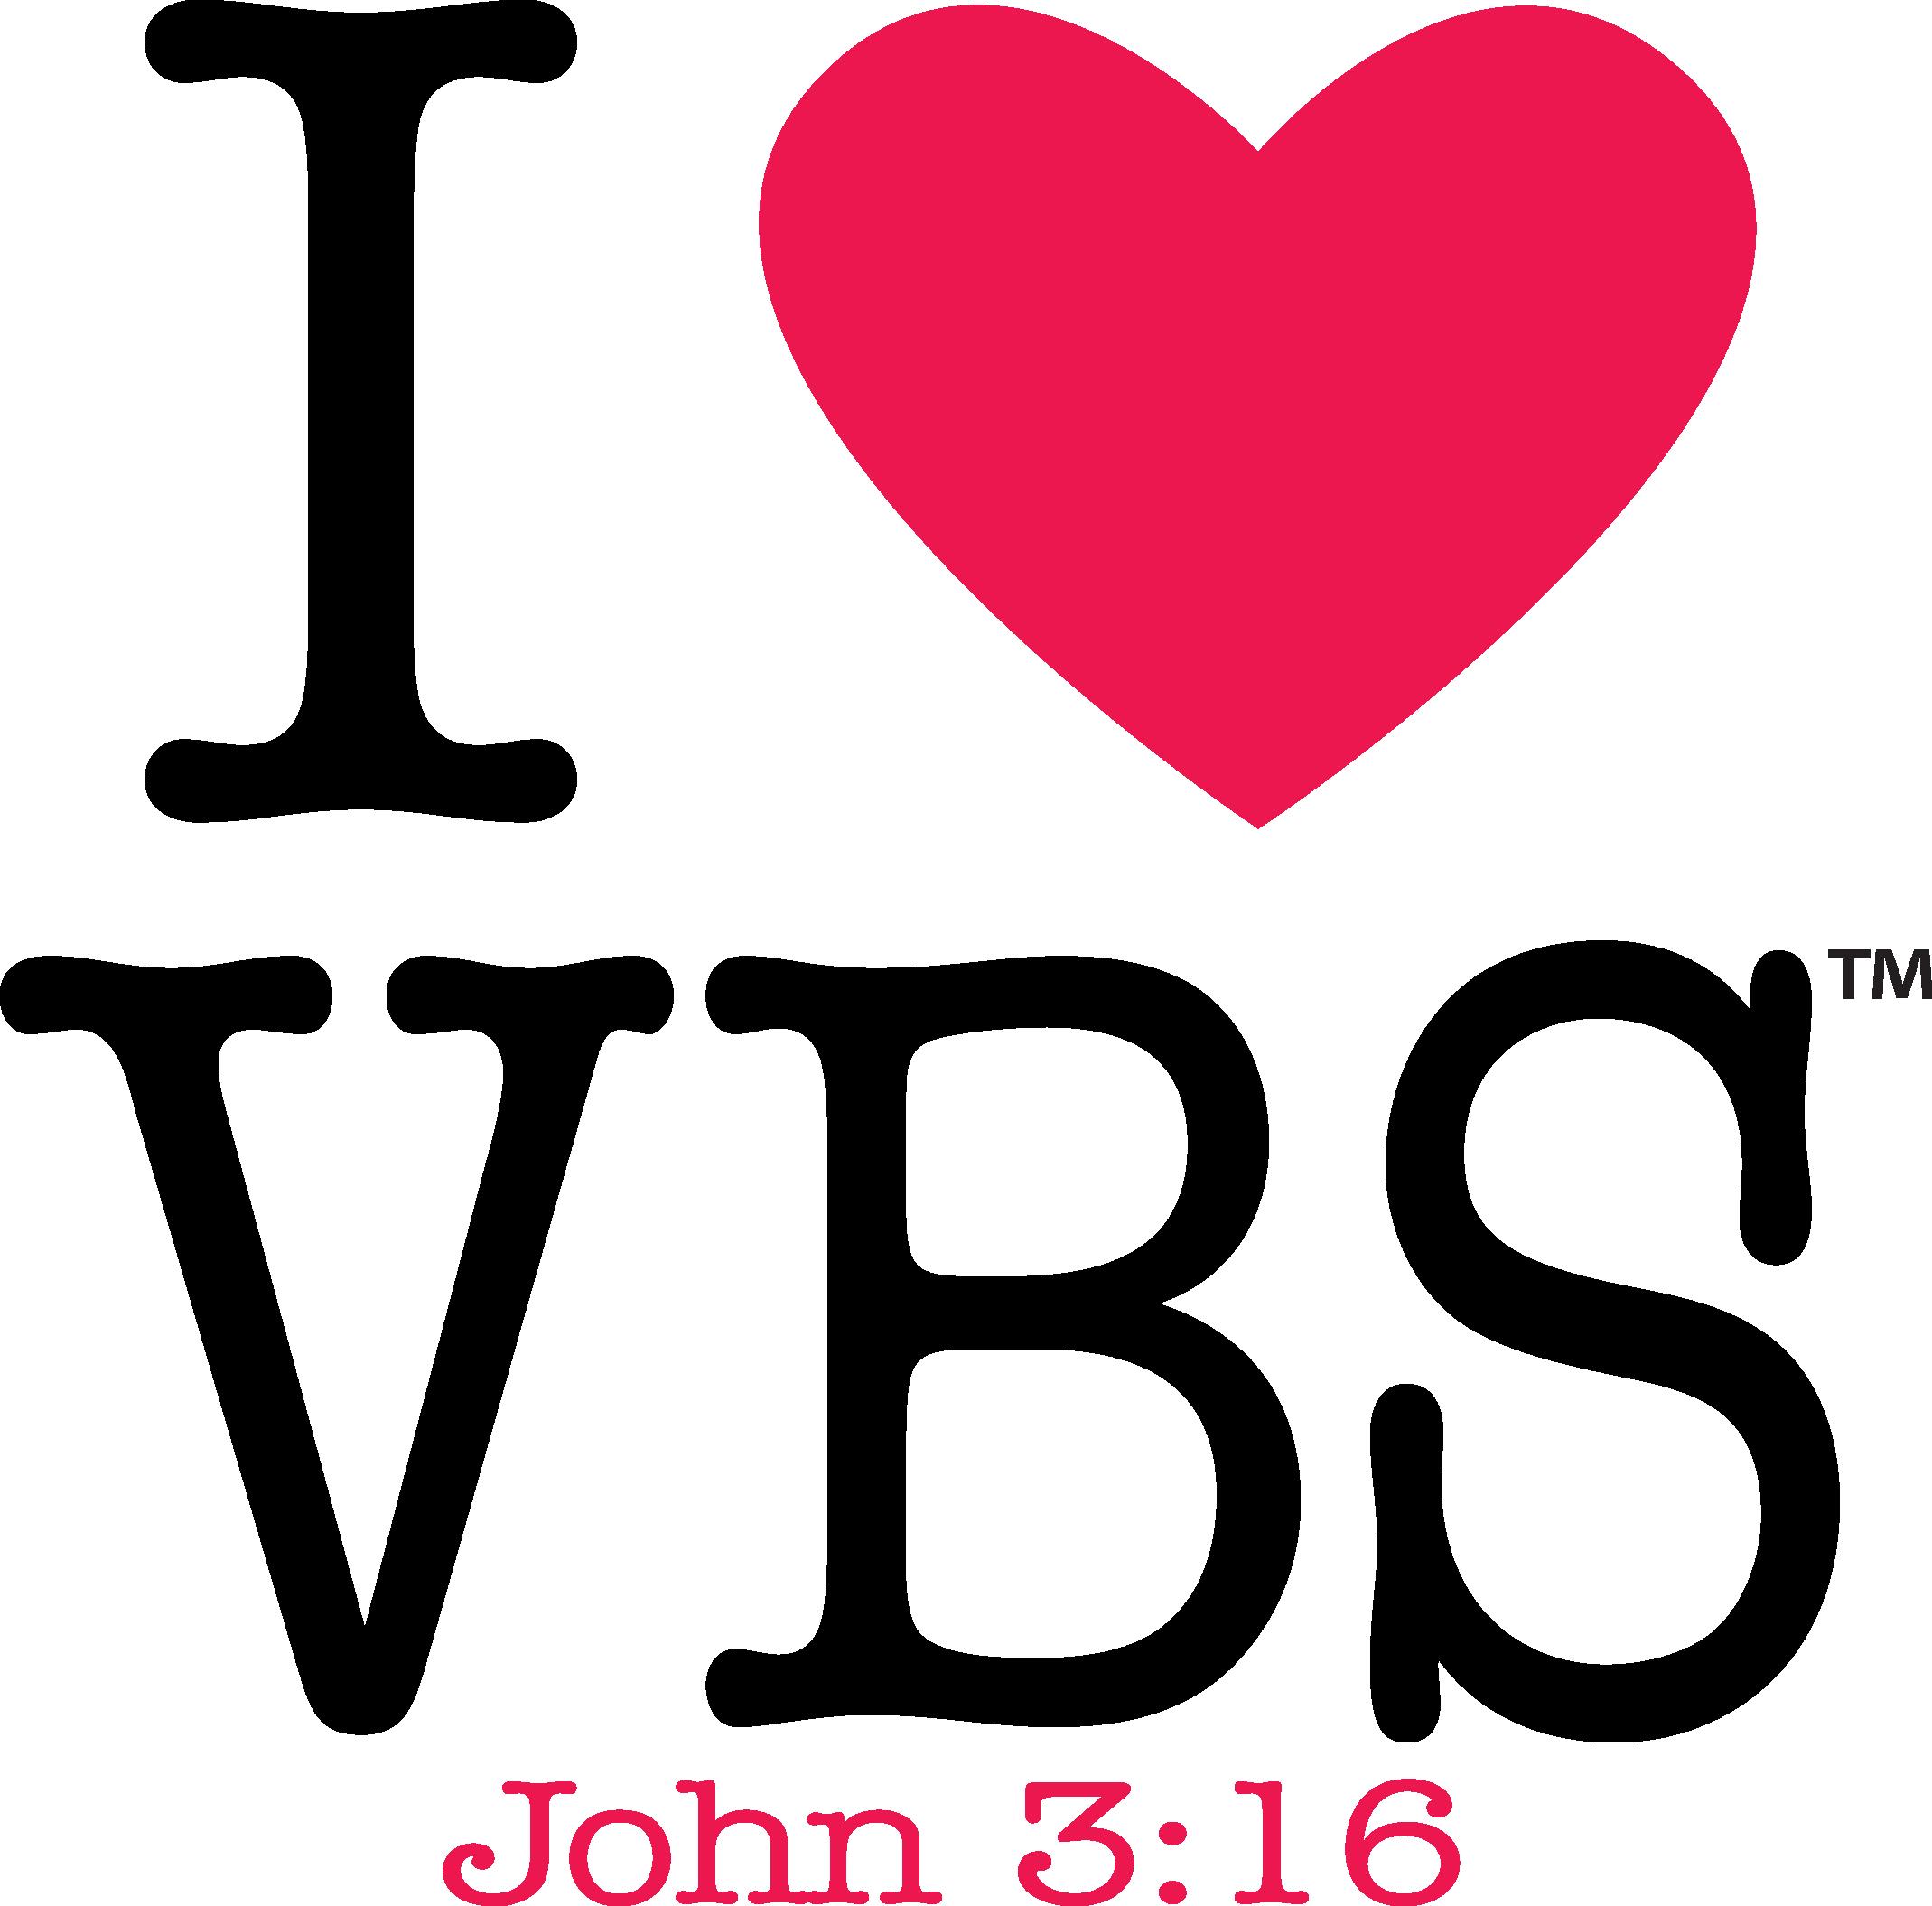 Christian heart clipart clipart stock Downloads & Media - LifeWay VBS clipart stock